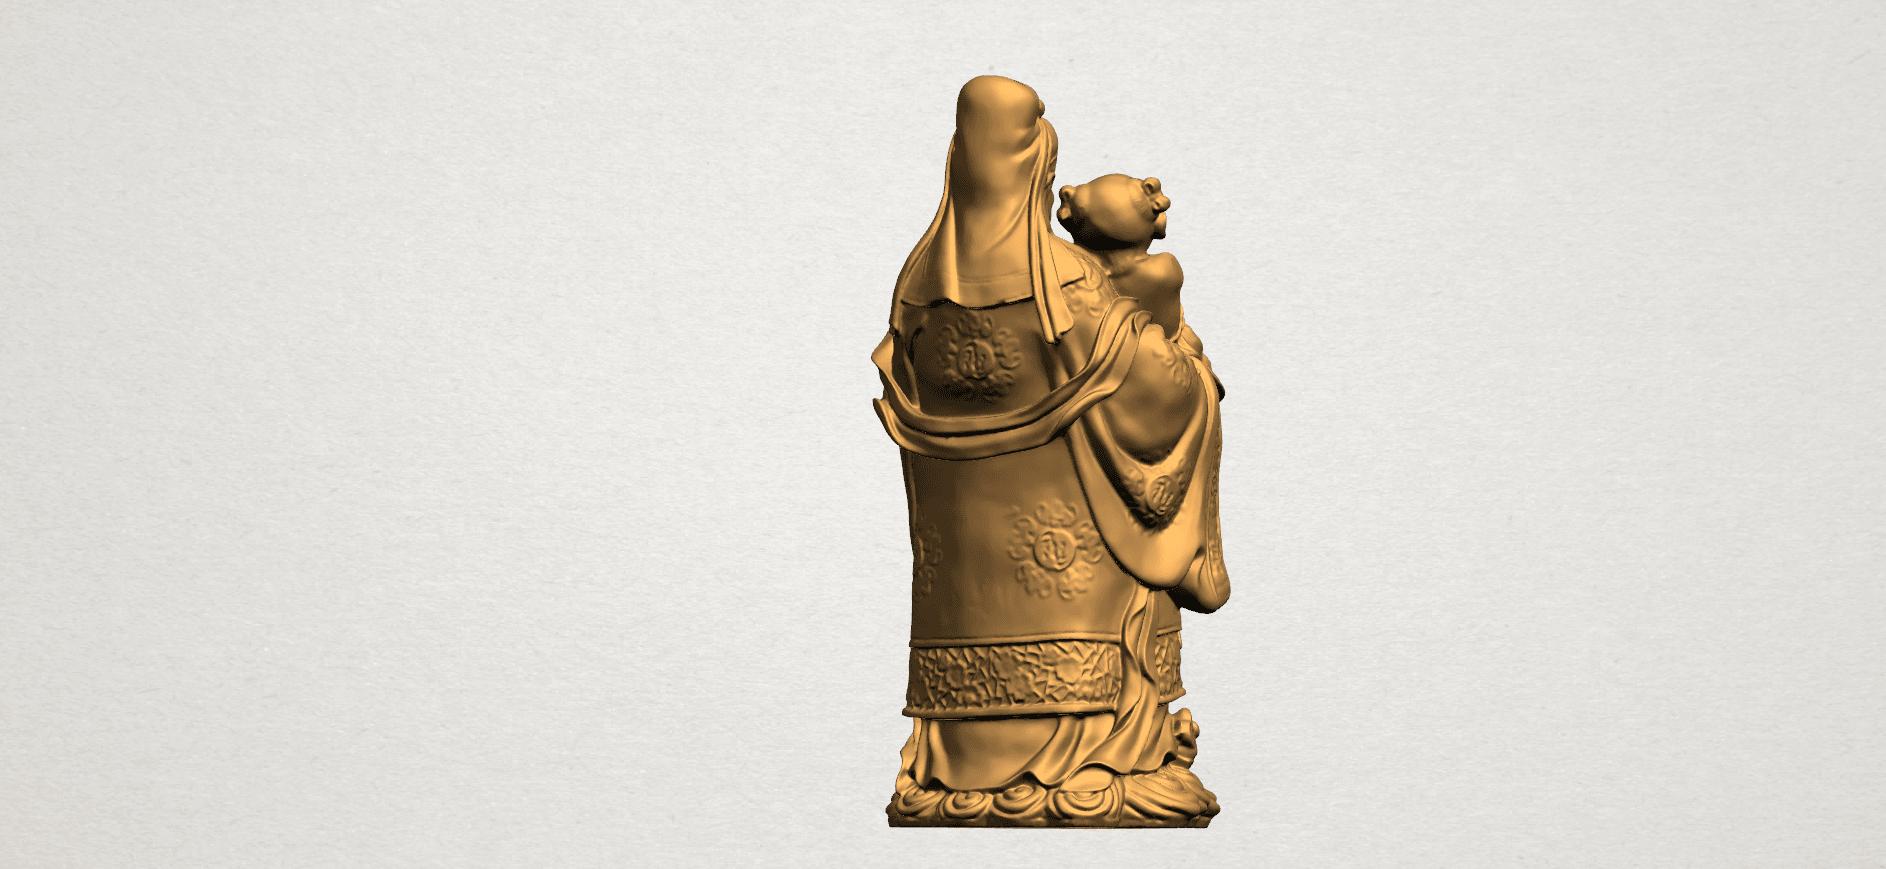 Fook (Fook Look Sao) 80mm - A05.png Télécharger fichier STL gratuit Fook (Fook Look Sao) • Design à imprimer en 3D, GeorgesNikkei